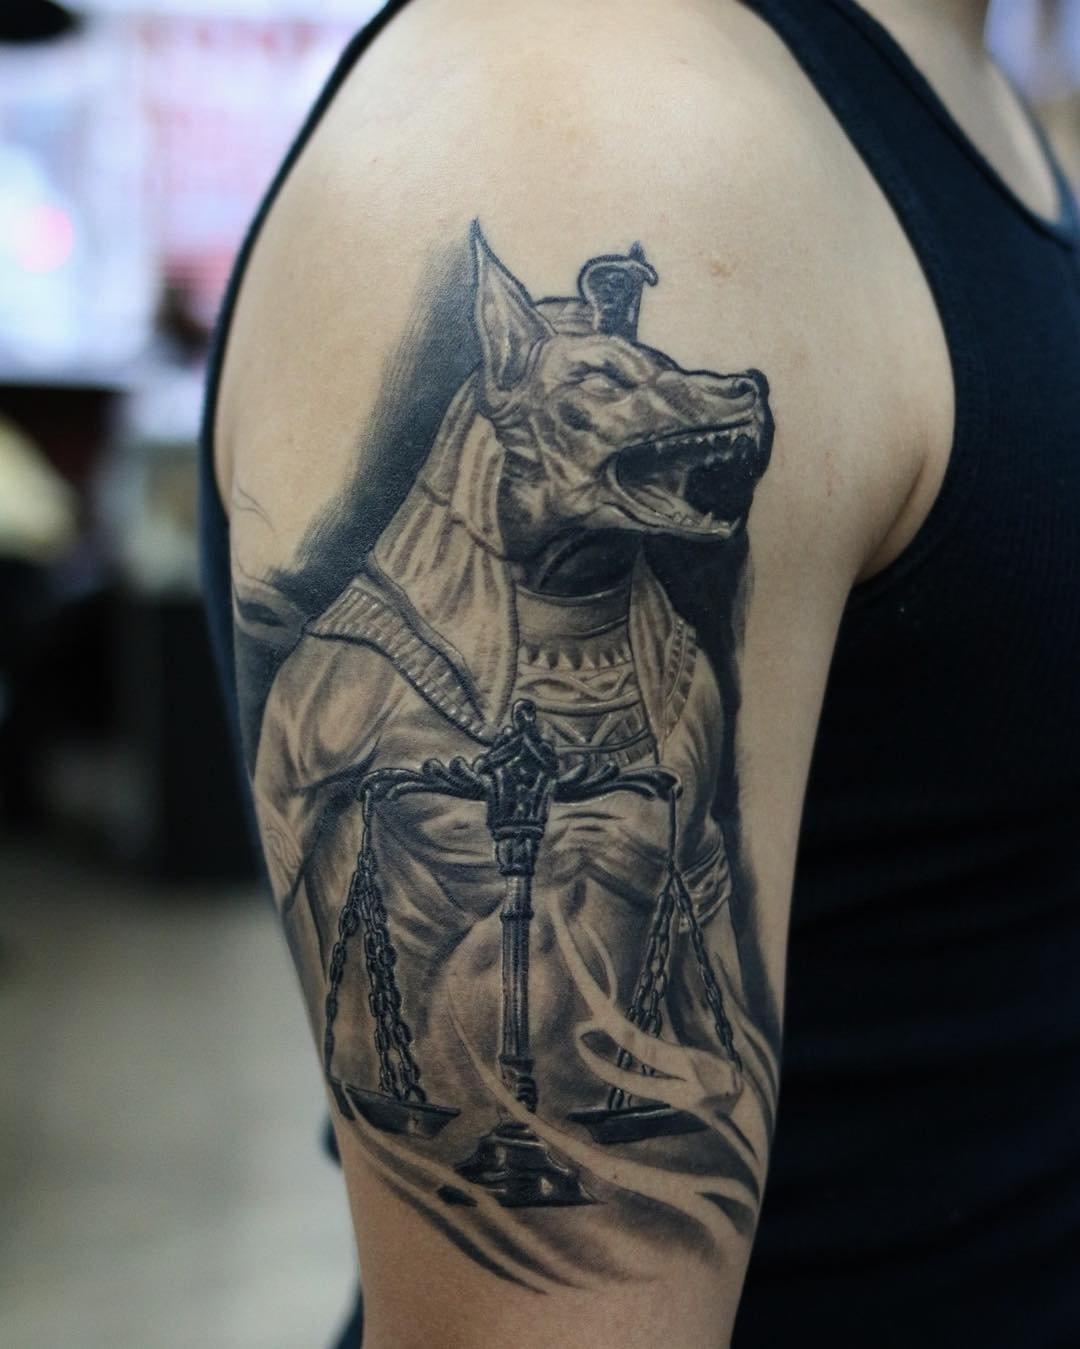 10 Best Half Sleeve Tattoos Ideas For Men 27 half sleeve tattoo for men designs ideas design trends 6